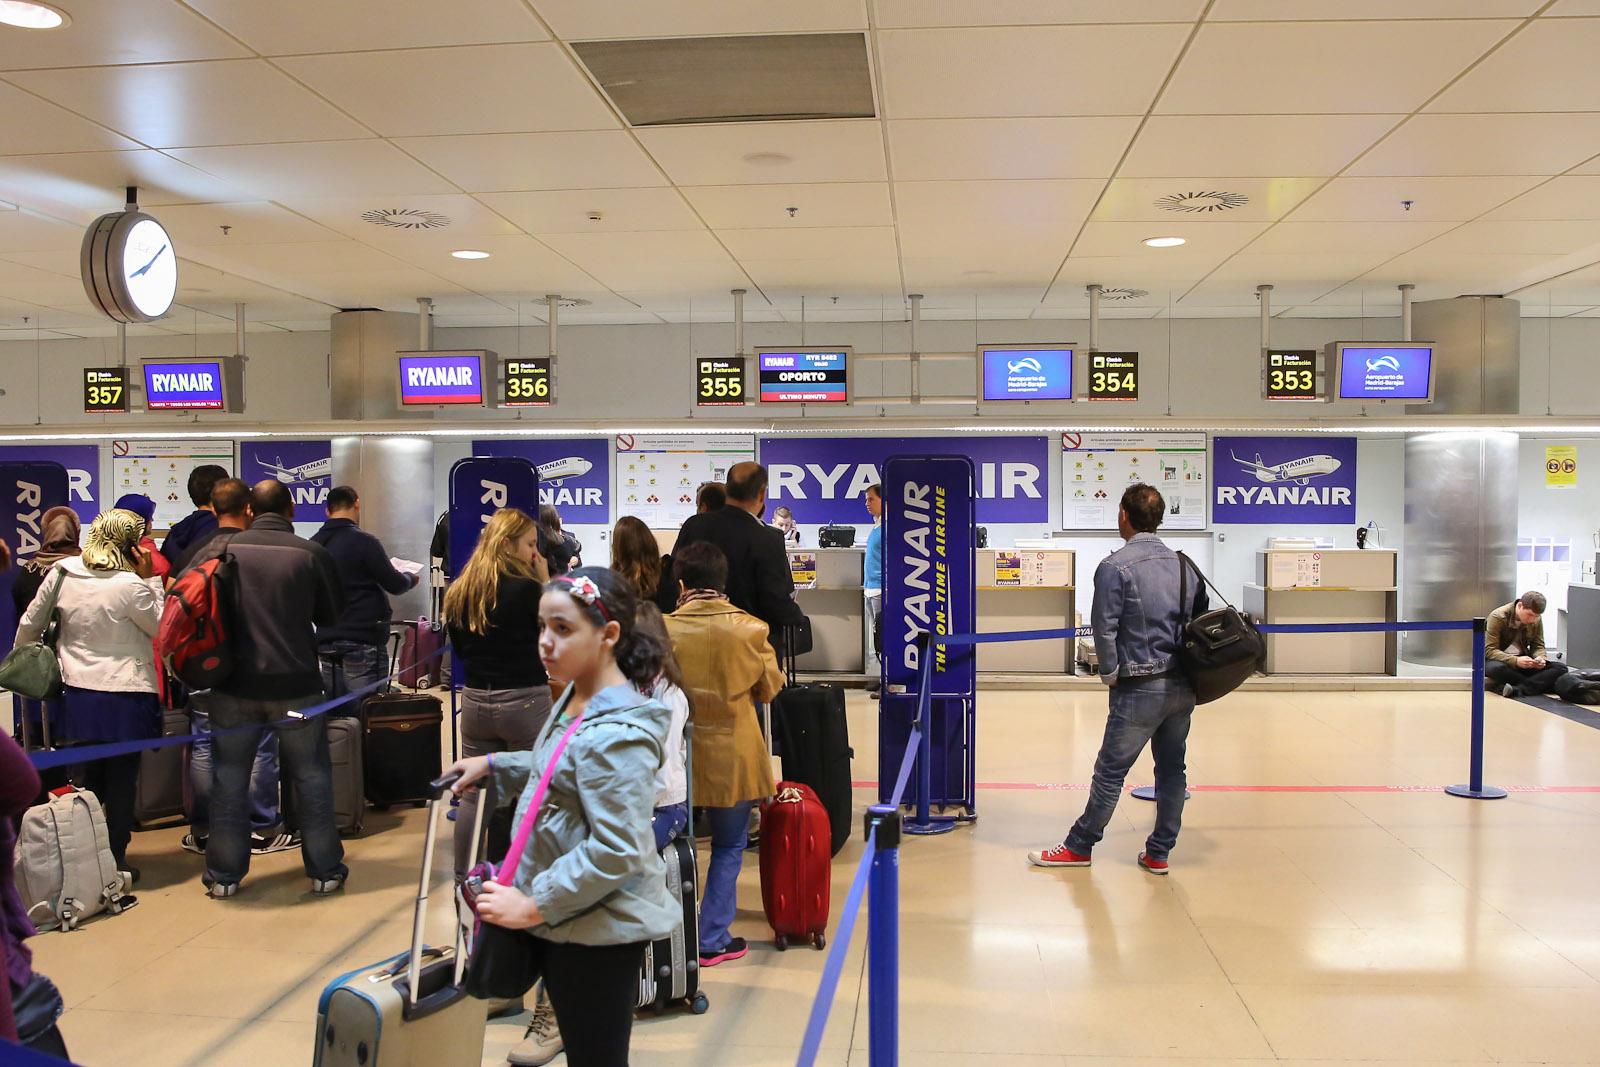 Регистрация на рейс Ryanair в аэропорту Барахас